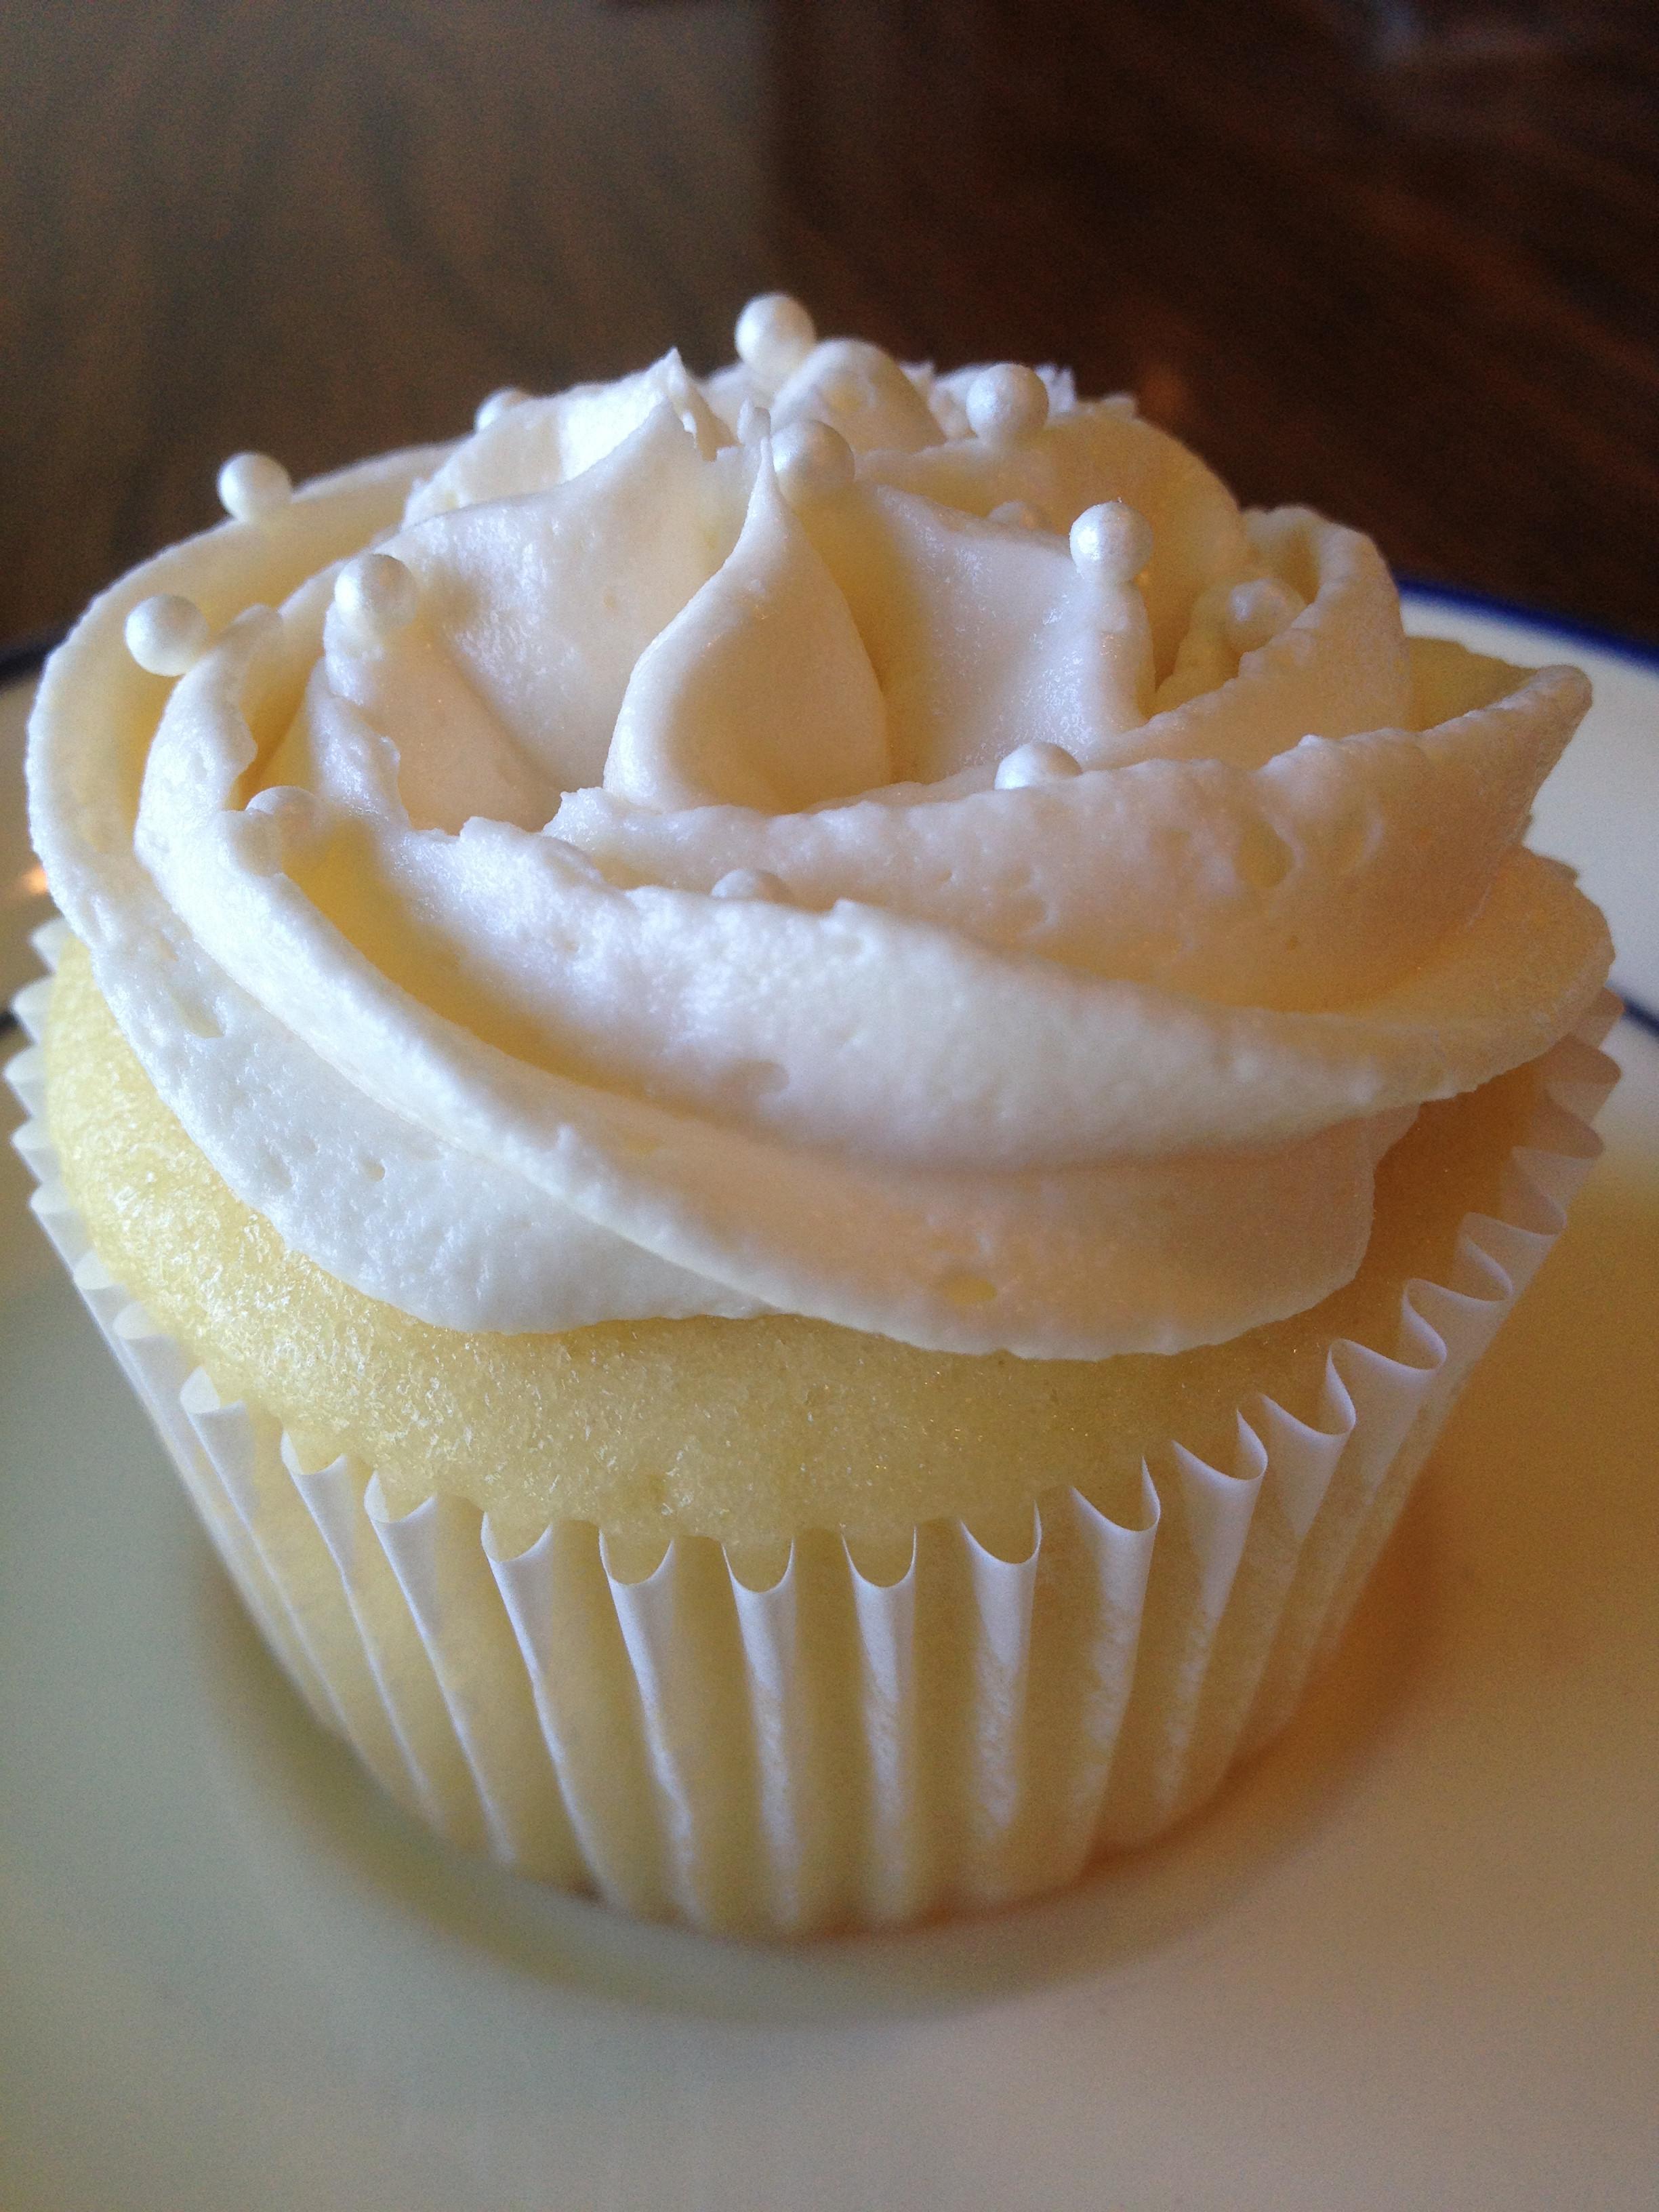 Wedding Cake Cupcakes Recipes  Cupcake Trial 2 White Wedding Cake